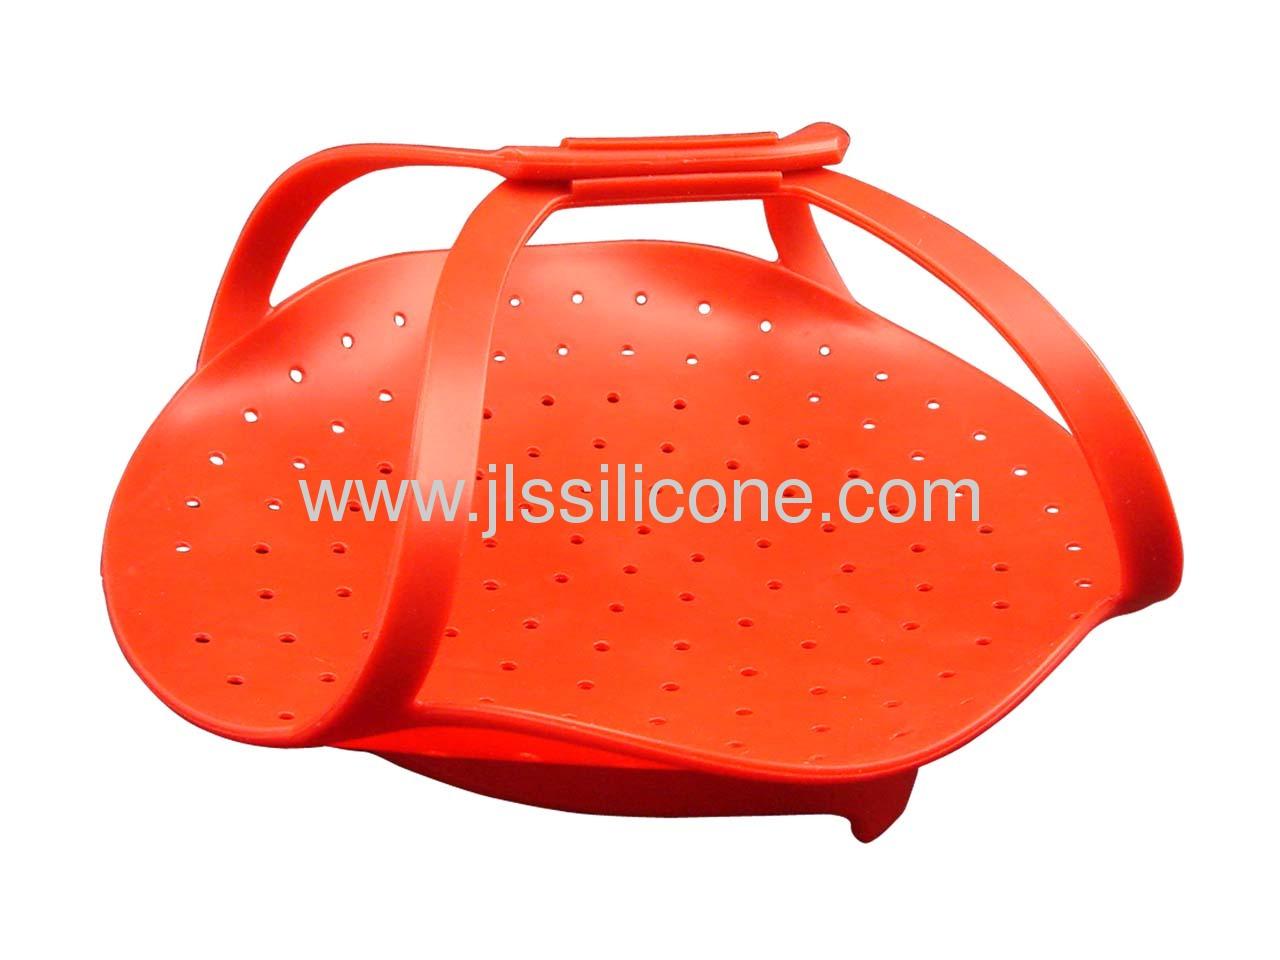 Fashion and portable silicone steamer